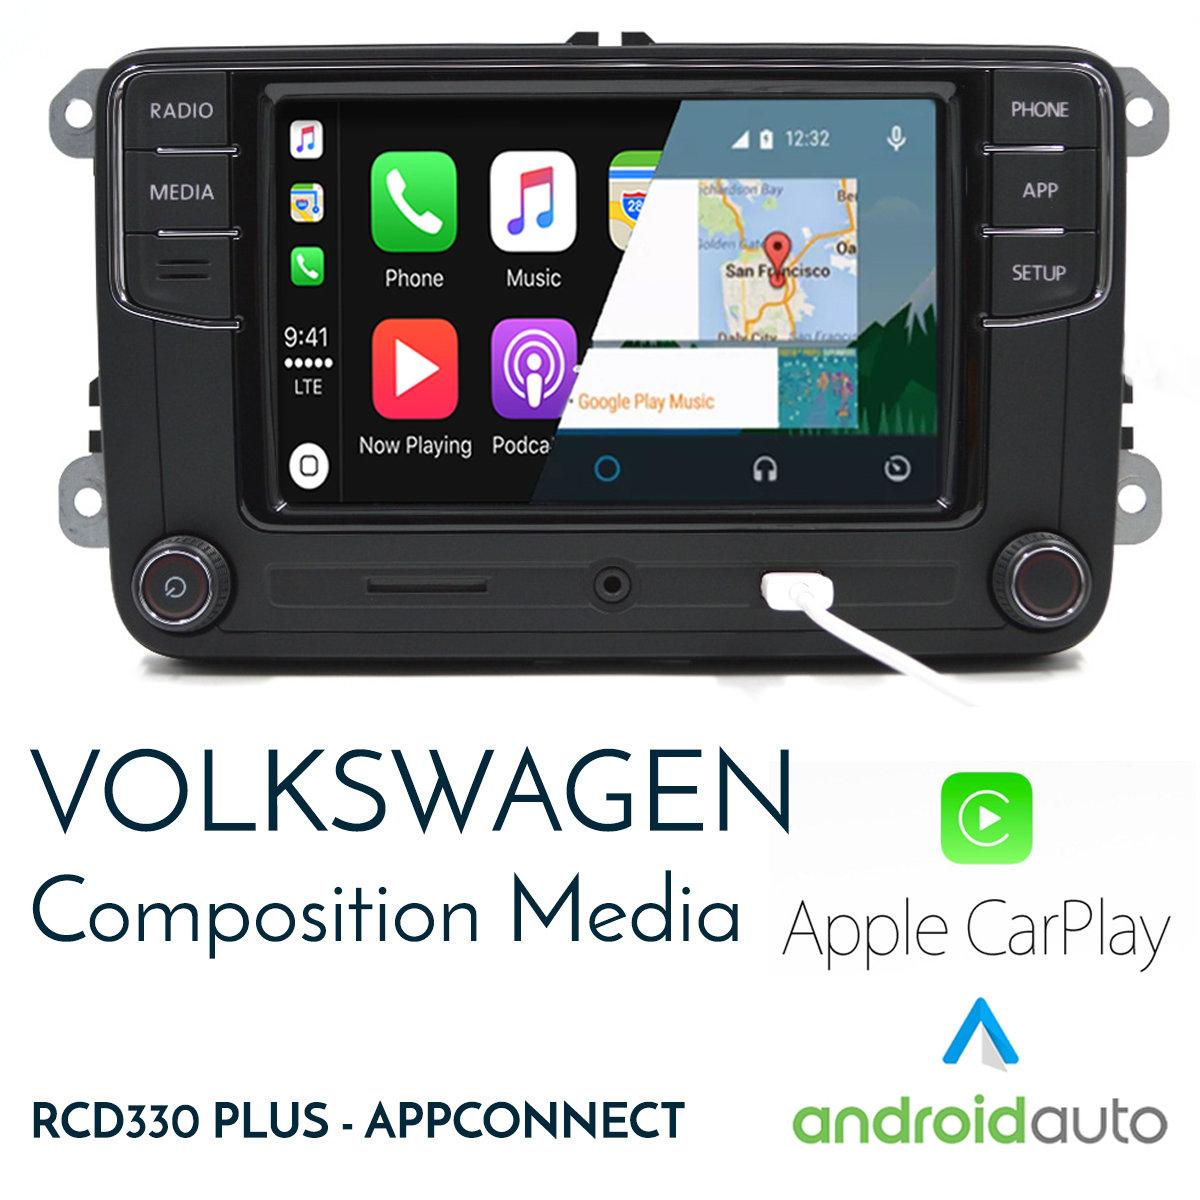 [Limited stock] Volkswagen RCD340 MIB AppConnect headunit - CarPlay & Android Auto integrated headunit